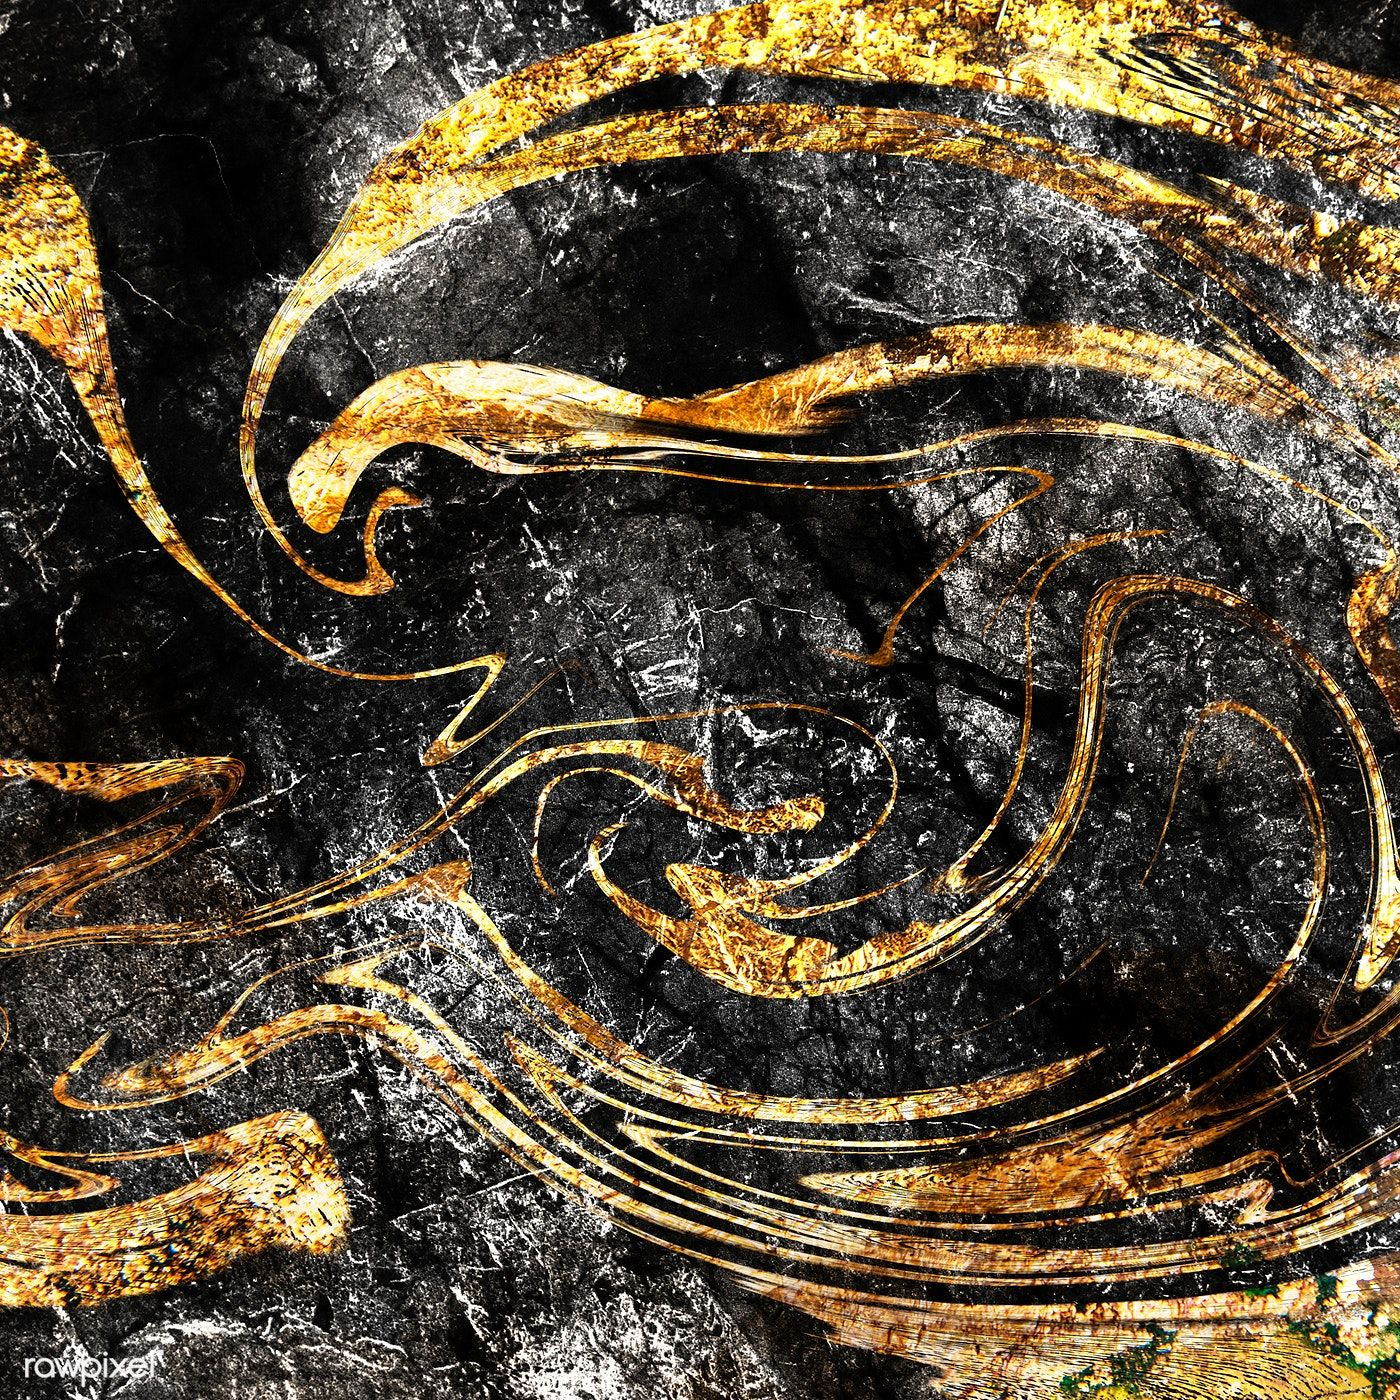 Download premium illustration of A plain swirl marble texture 1213224 #marbletexture